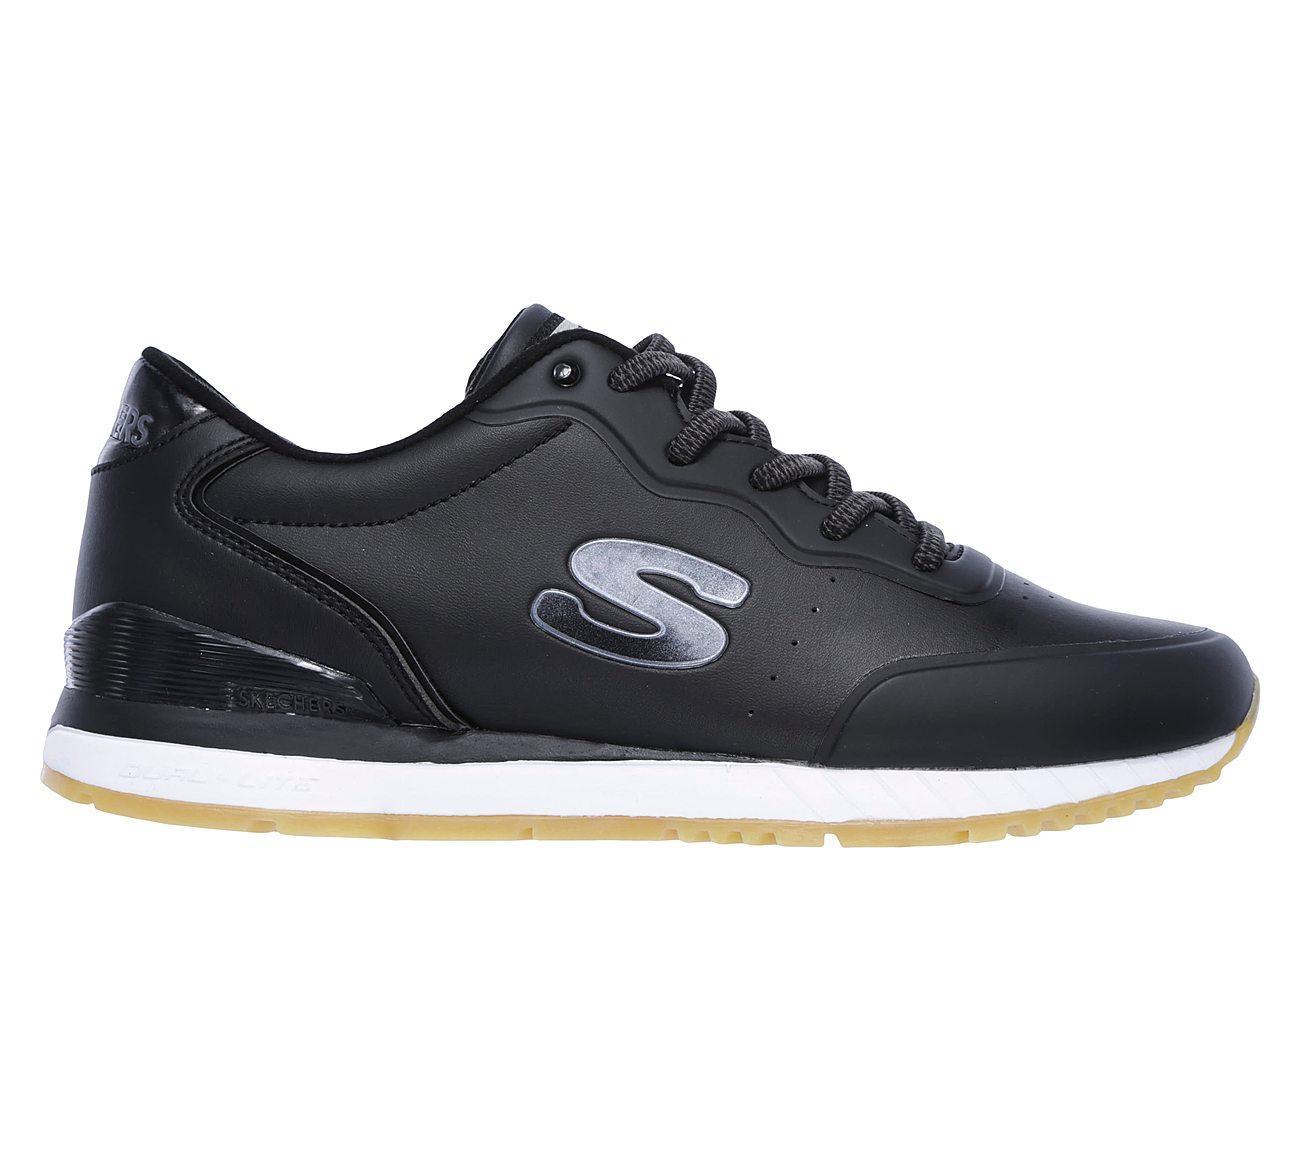 Skechers Sunlite Shimmies Sport Shoes Womens In Black